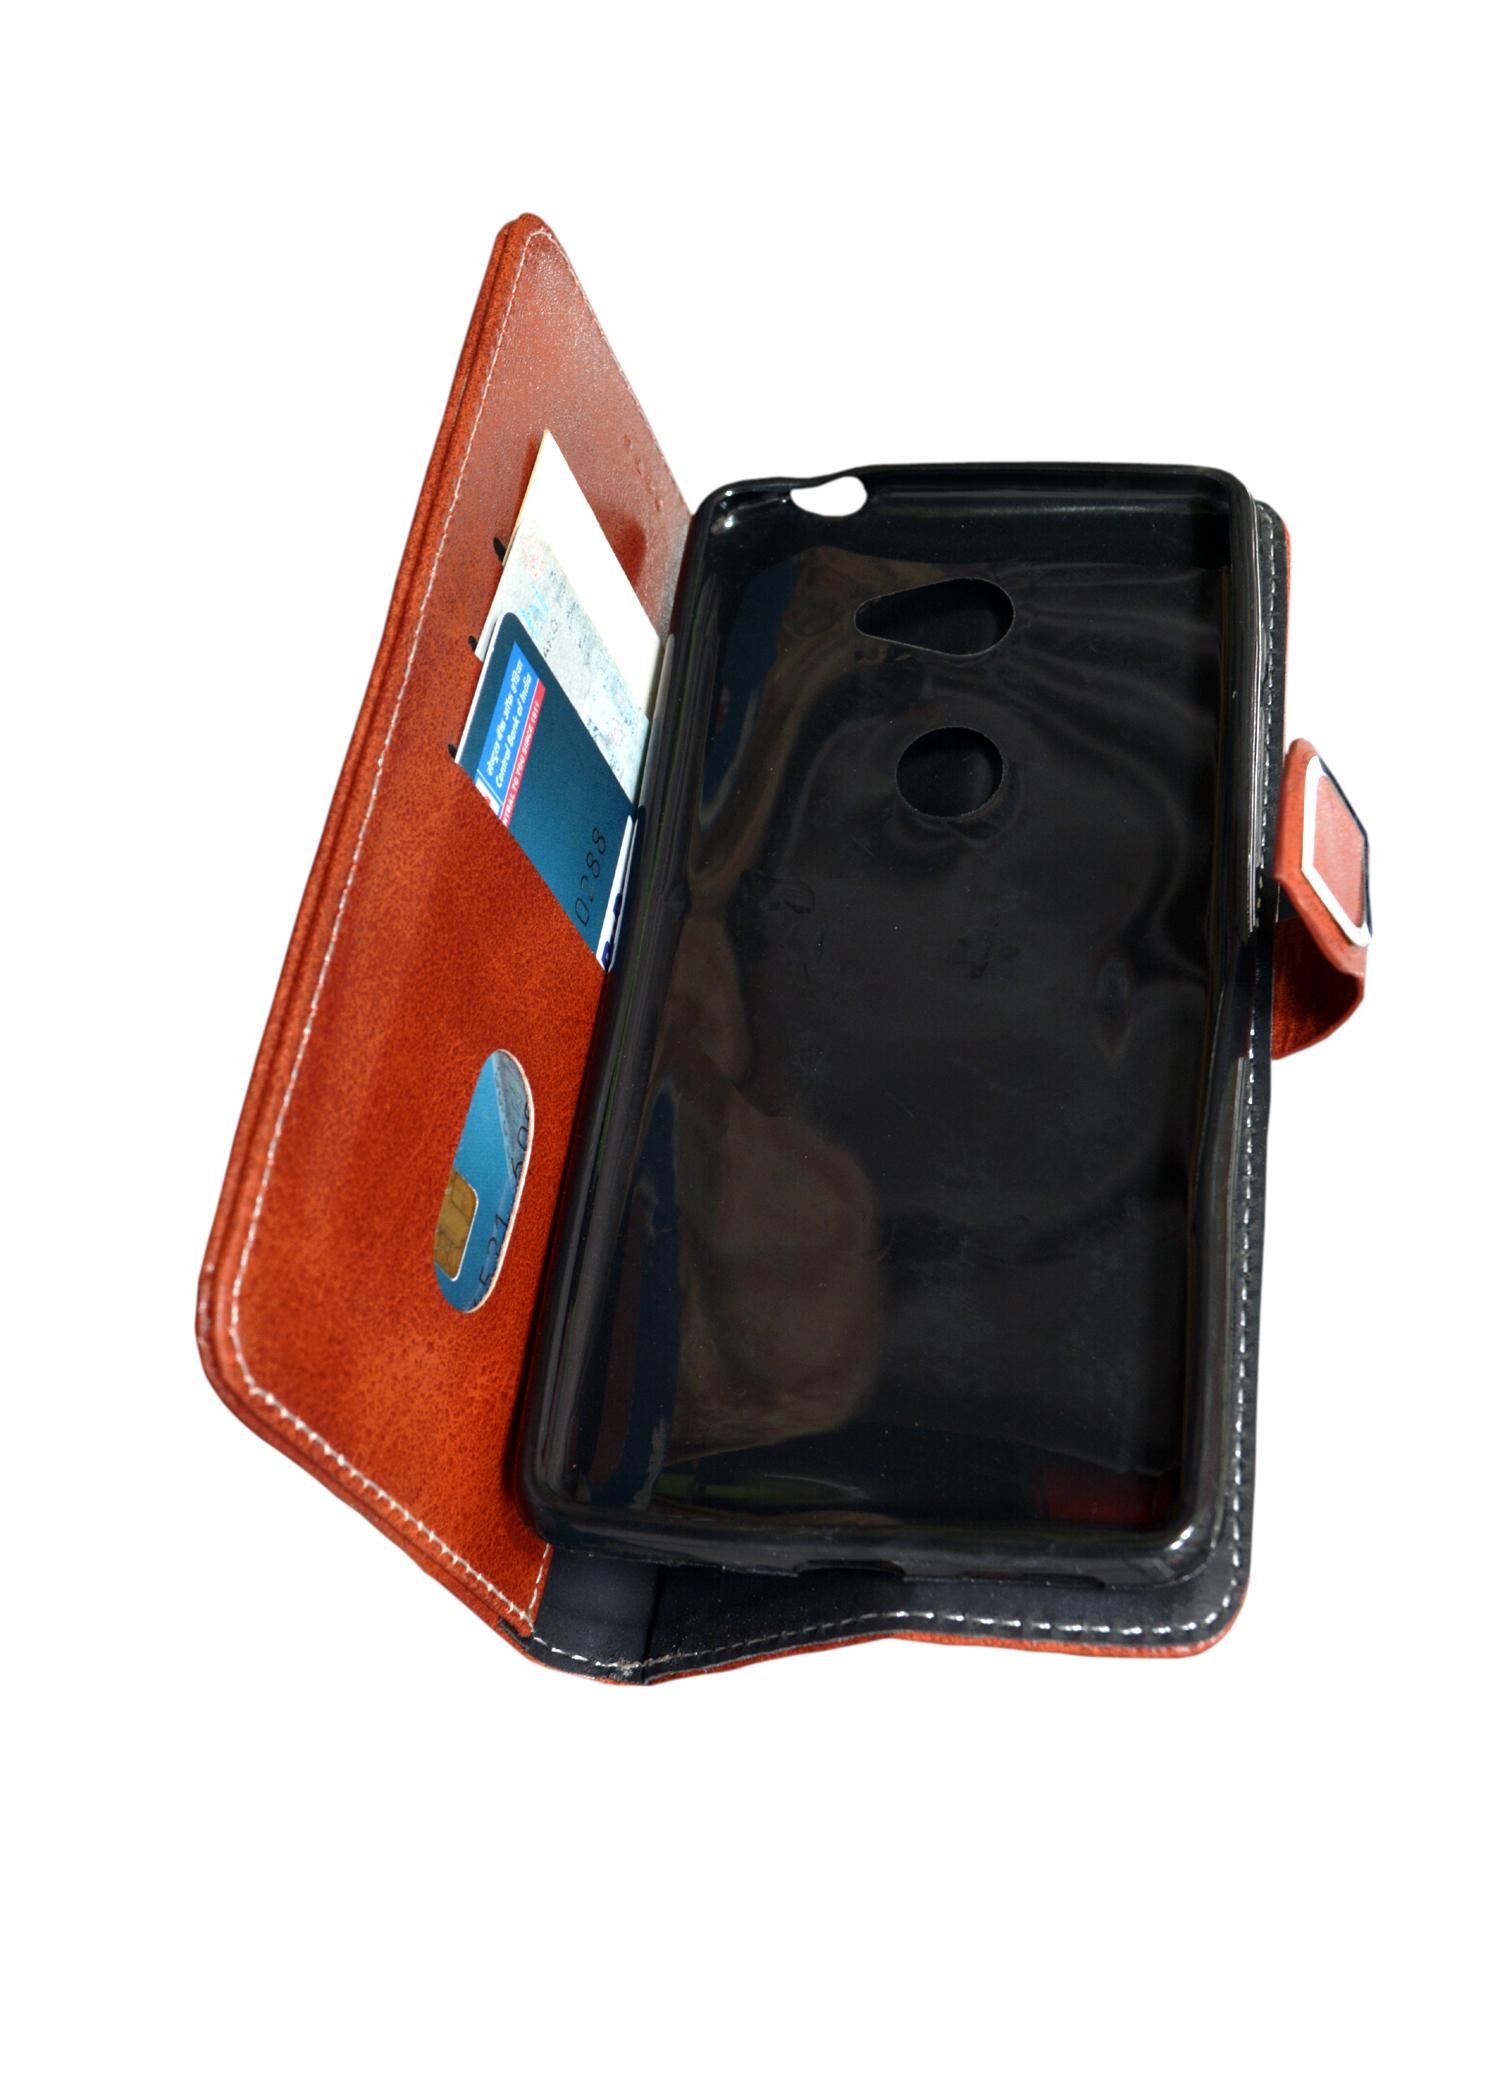 oppo realme 2 pro mobile flip cover